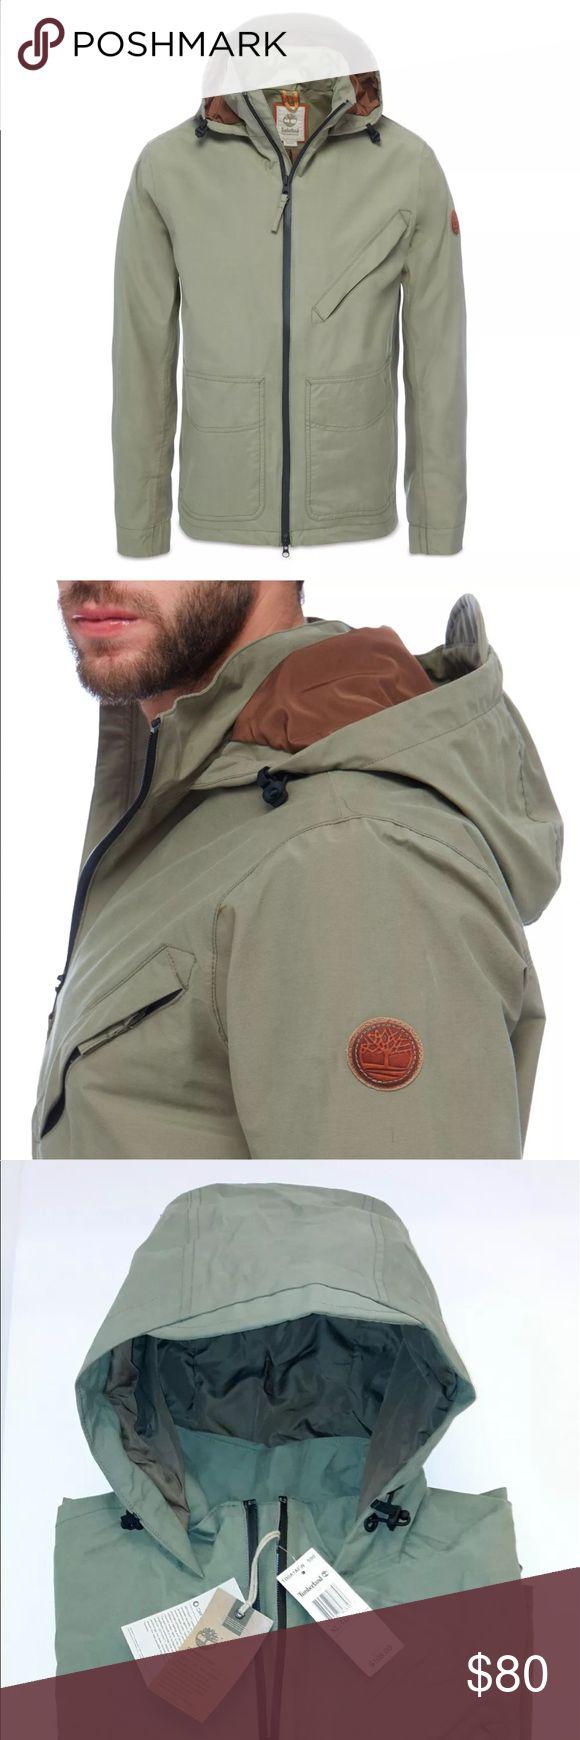 Men's TIMBERLAND winter jacket MEN'S TIMBERLAND MOUNT CLAY WHARF WATERPROOF BOMBER TB0A1AFW 590 Timberland Jackets & Coats Lightweight & Shirt Jackets